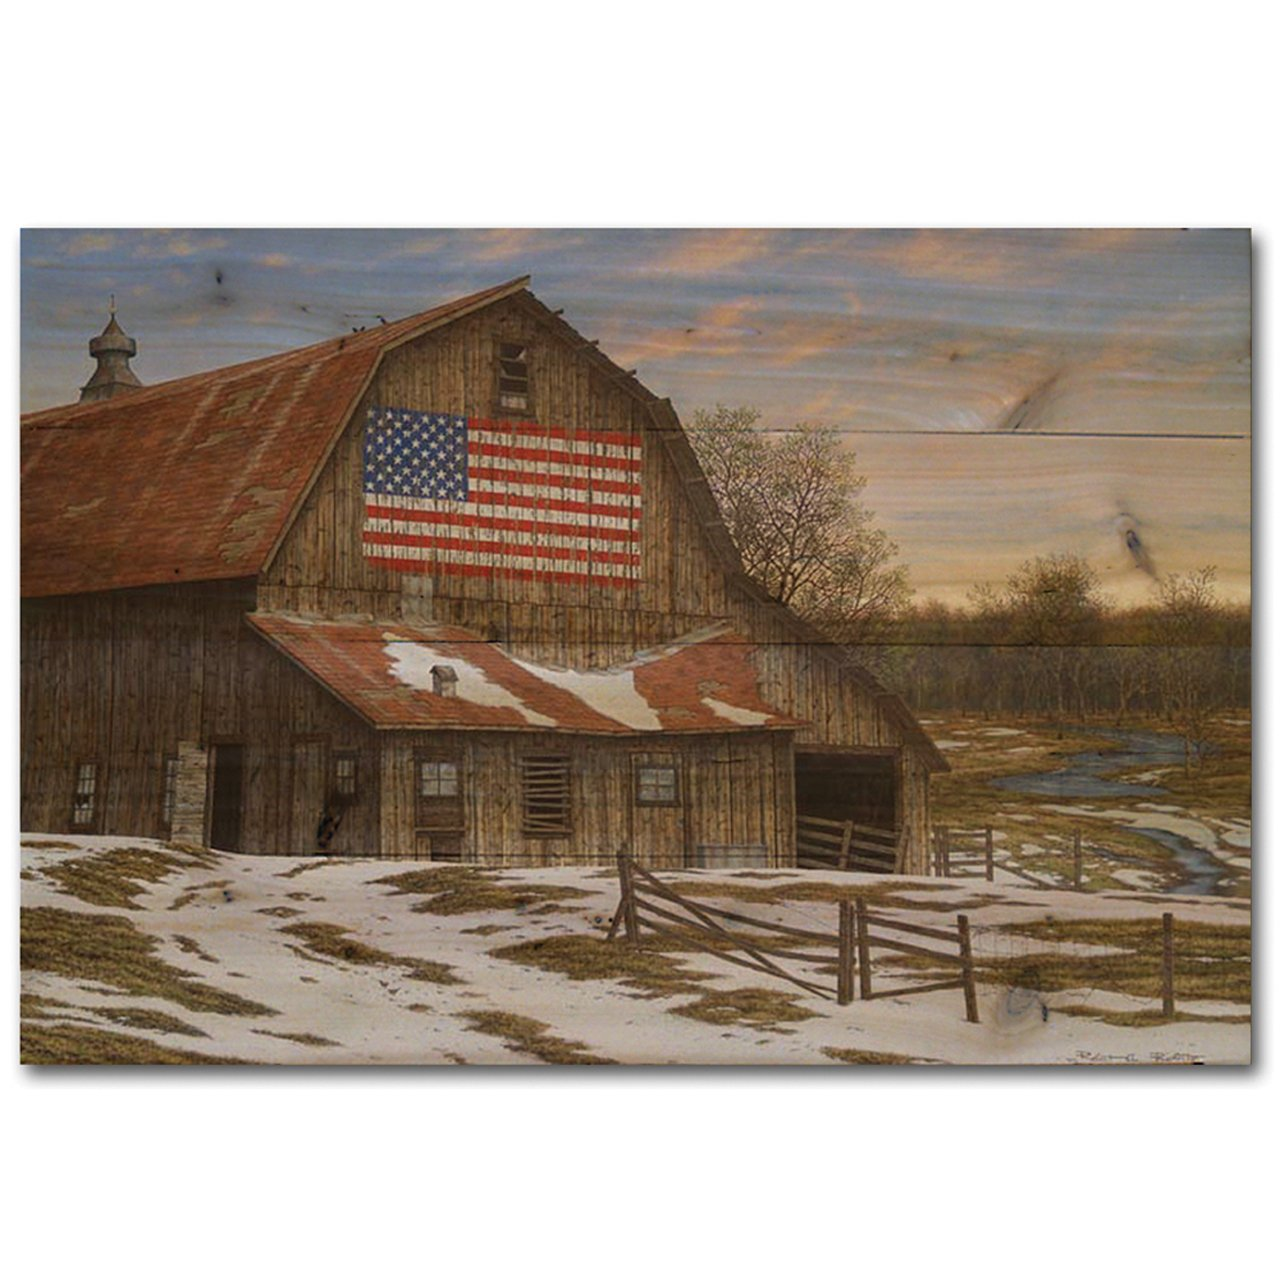 WGI-GALLERY WA-ELB-4030 Enduring Legacy Barn Wall Art